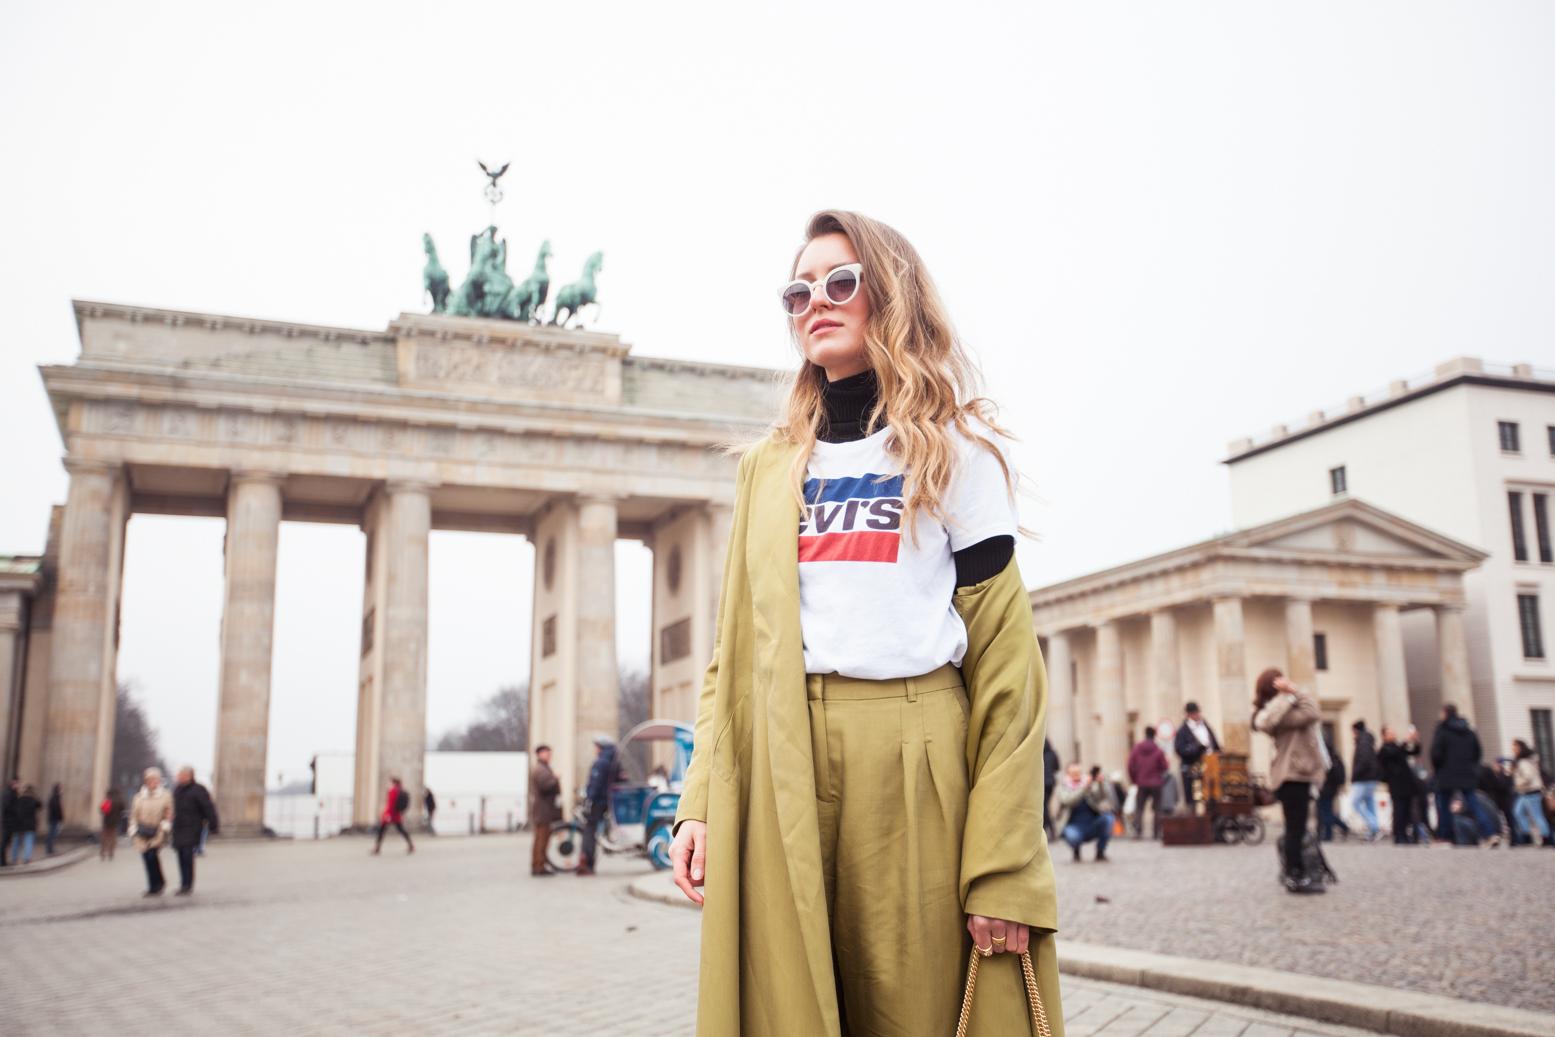 fashionweek-streetstyle-ivy&oak-livia-auer-5961